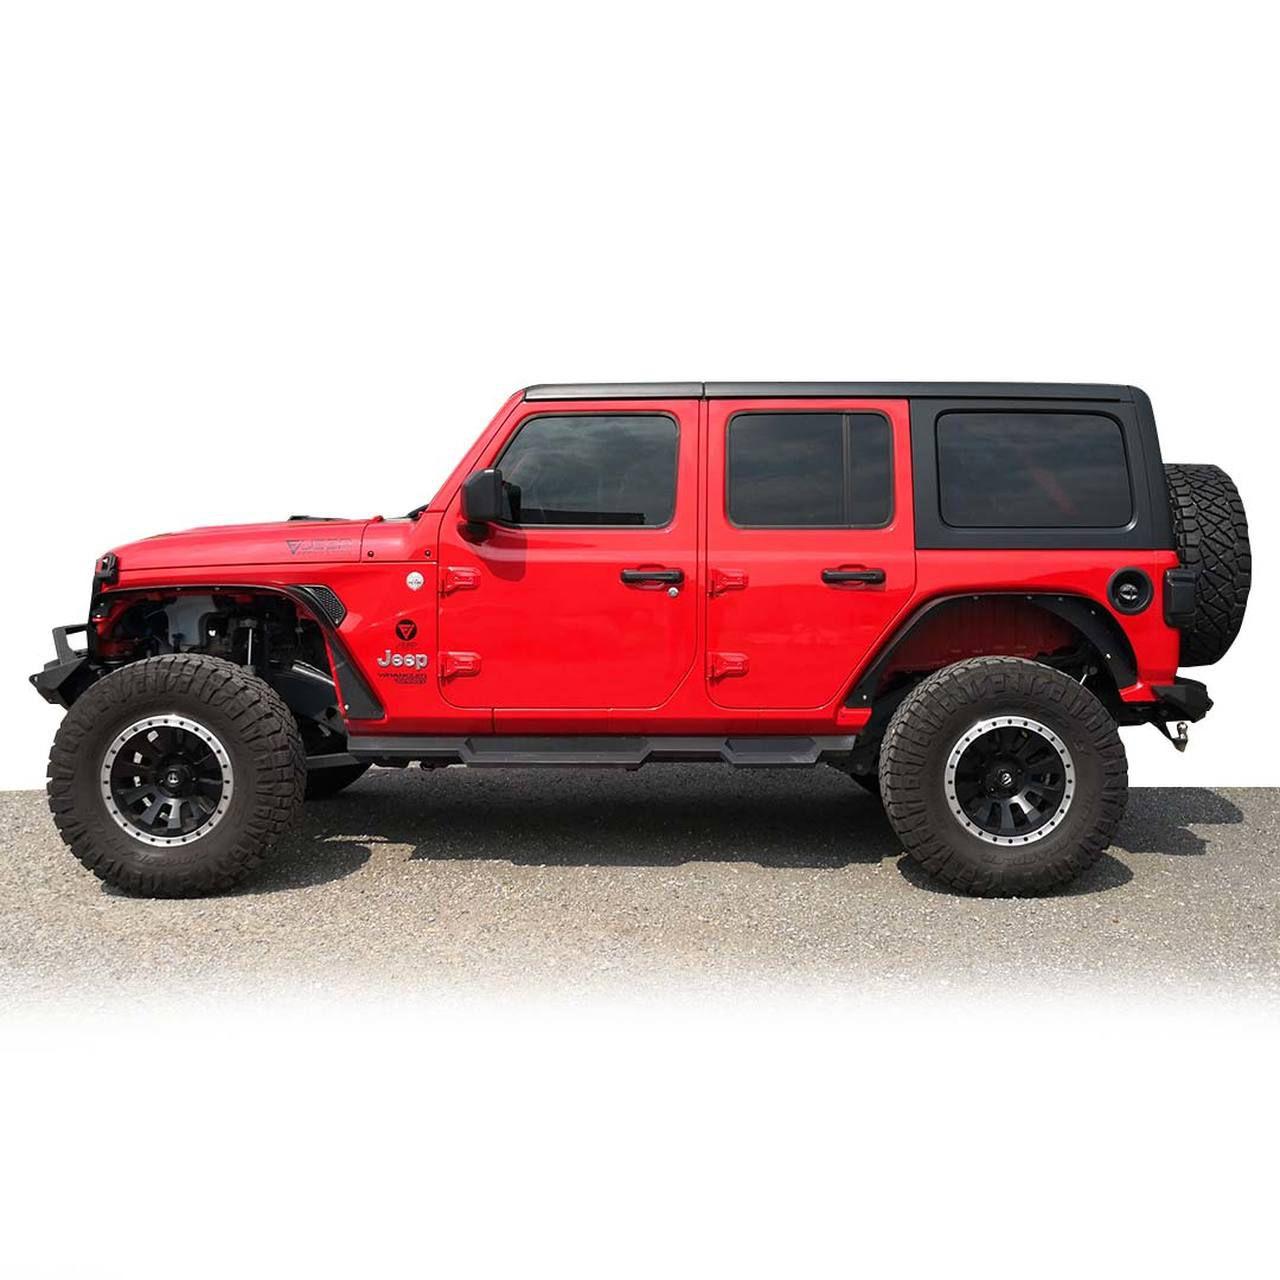 NEW Jeep Wrangler JL, JLU, Flat Top style metal fenders